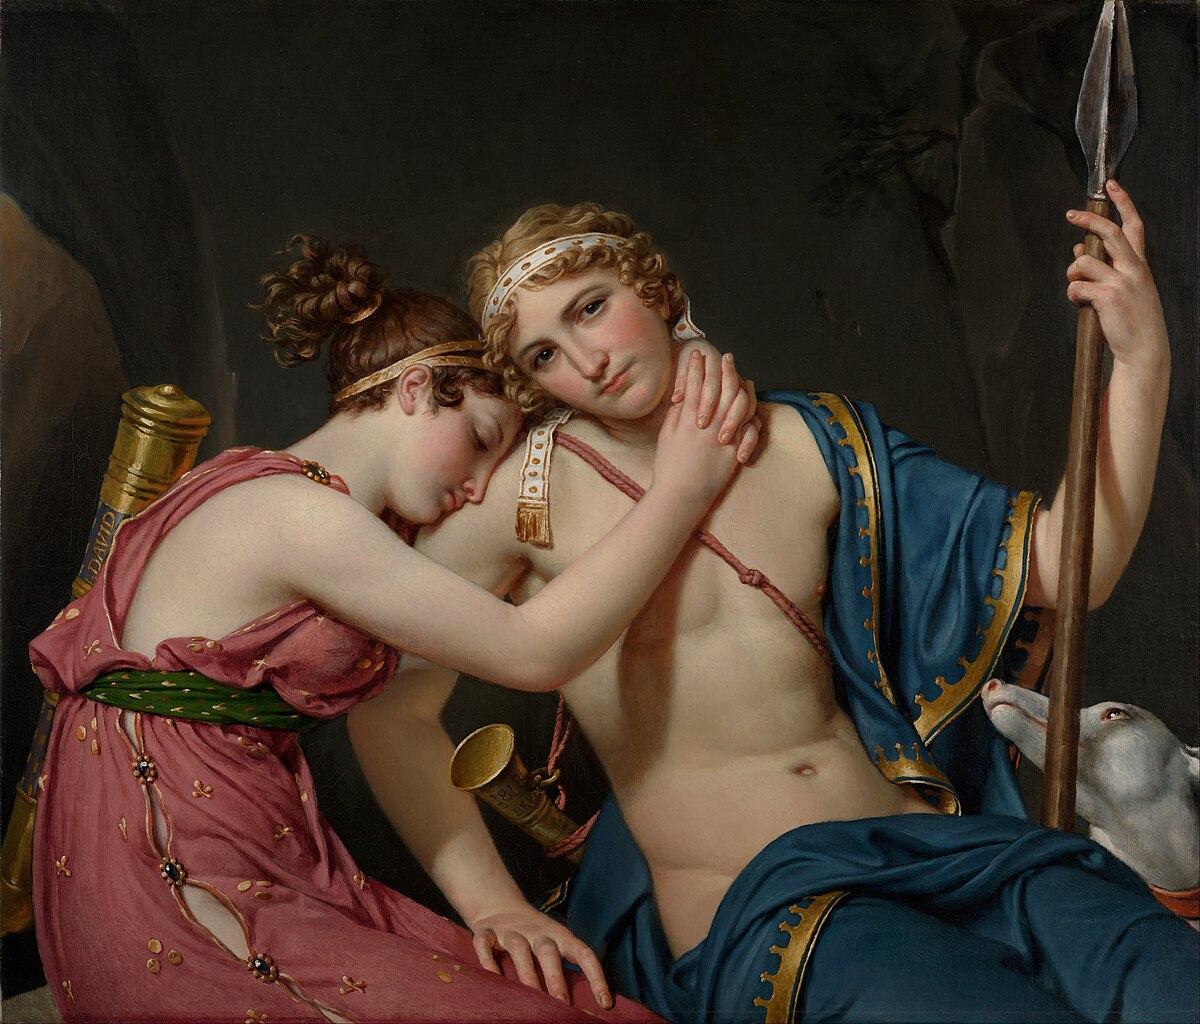 Erotic literature preservation project